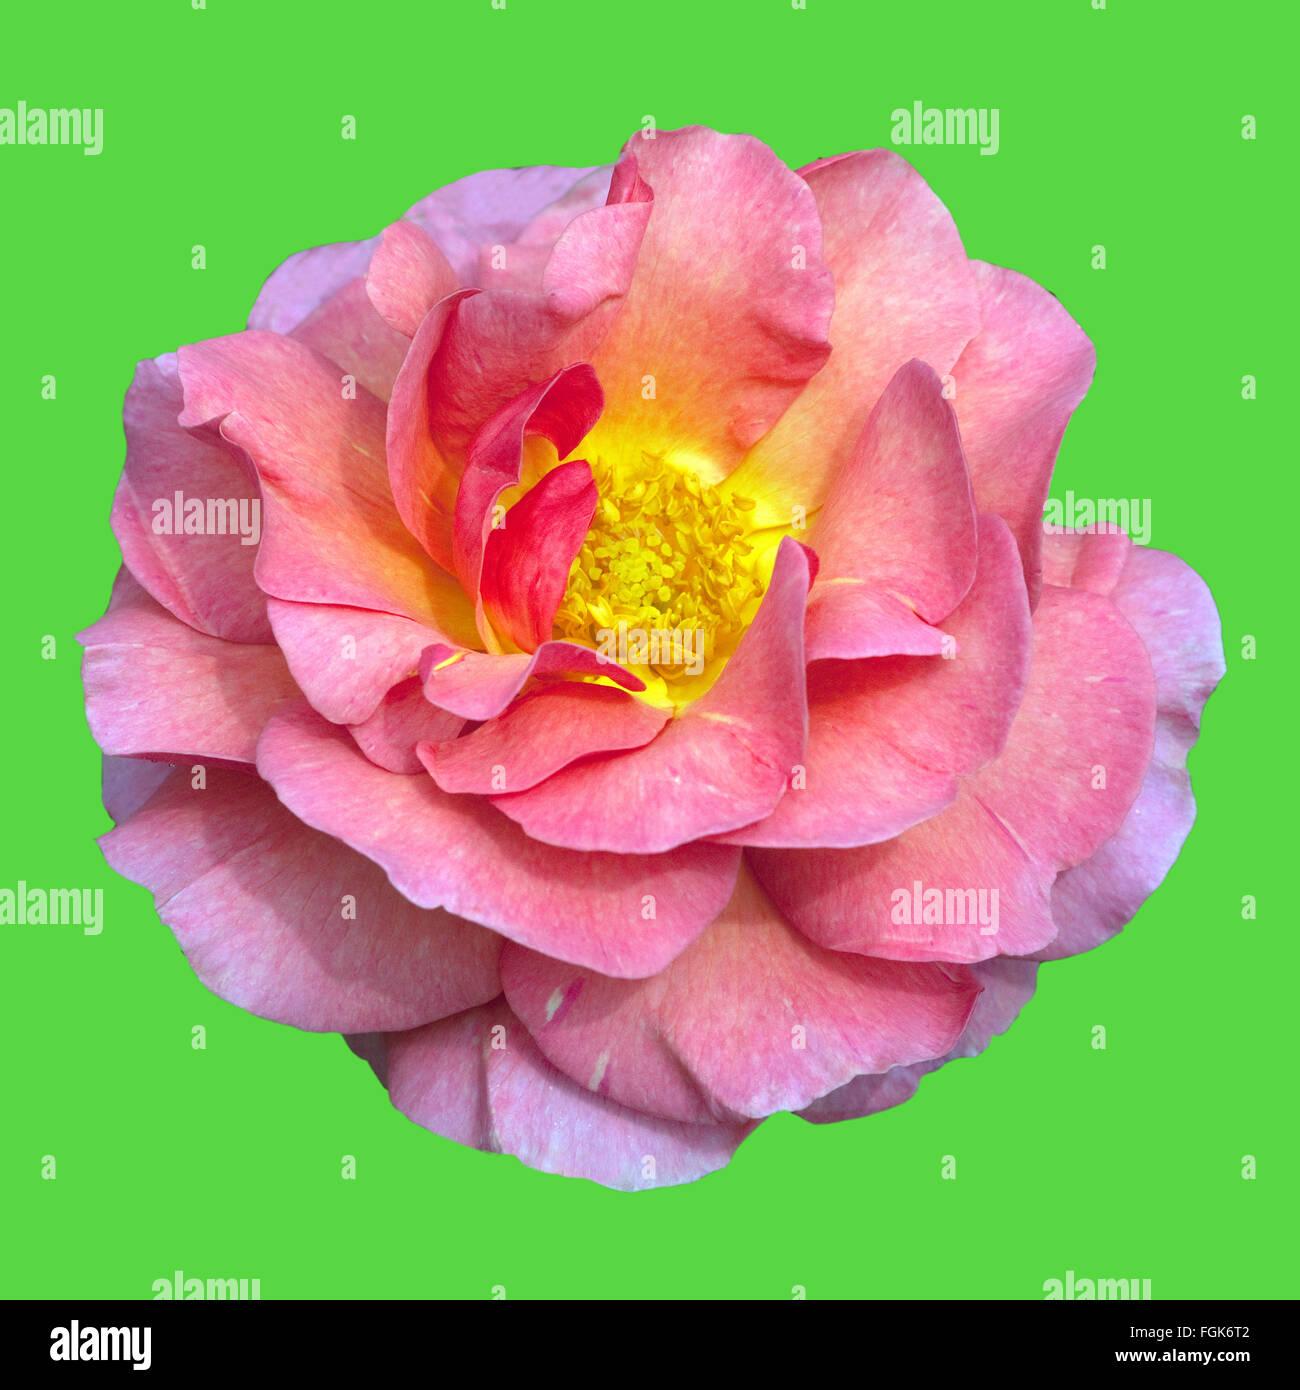 englische rose lilian austin stock photo royalty free image 96308802 alamy. Black Bedroom Furniture Sets. Home Design Ideas